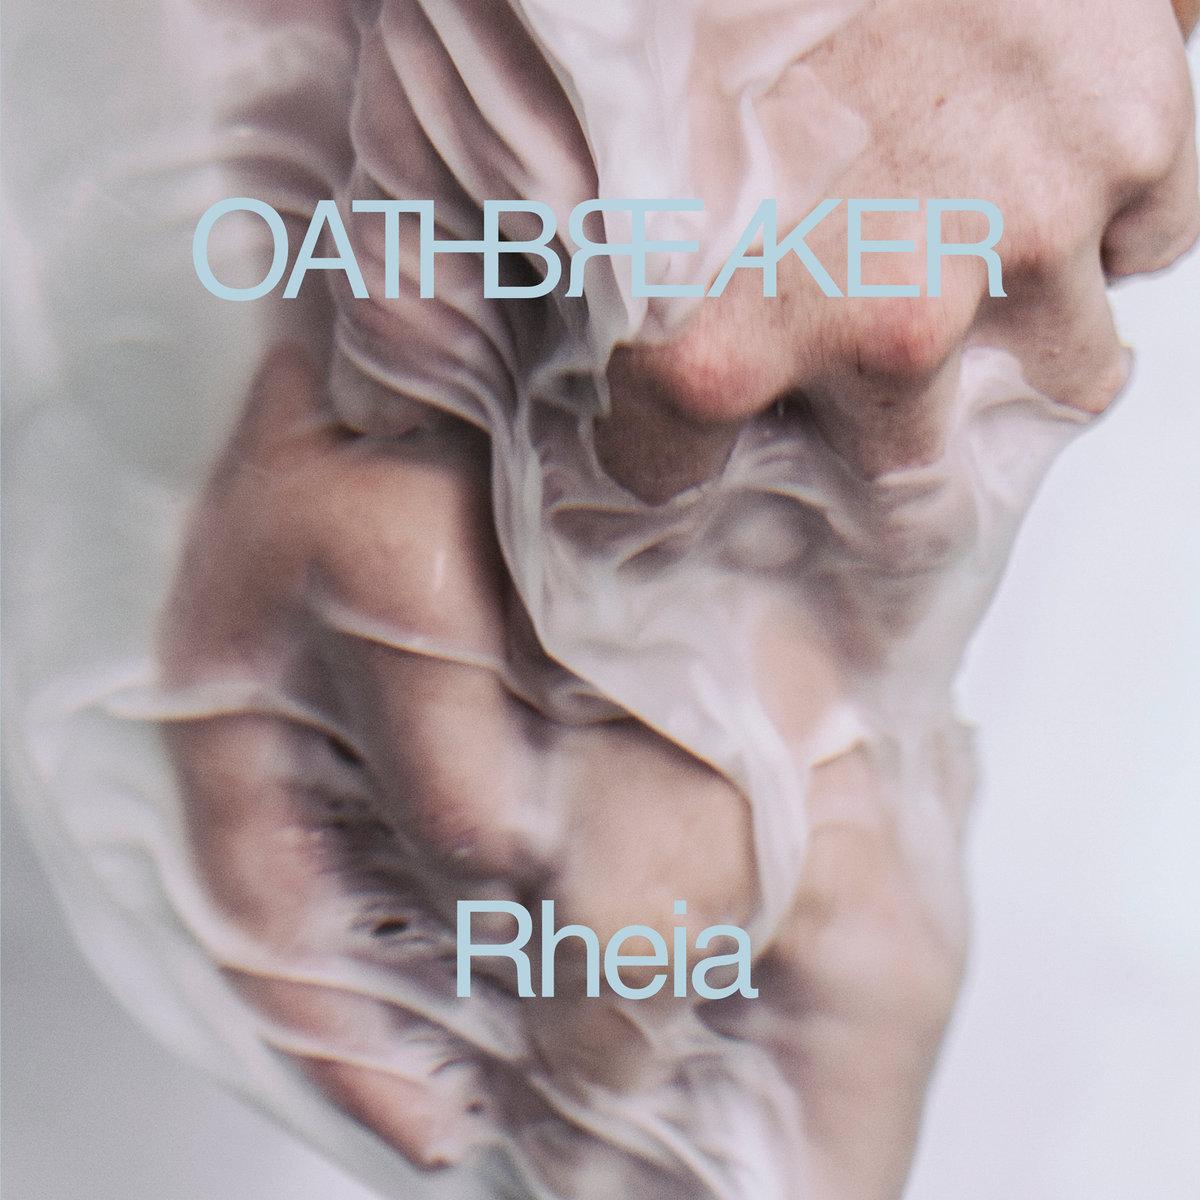 OATHBREAKER Rheia – Vinyl 2xLP (black)